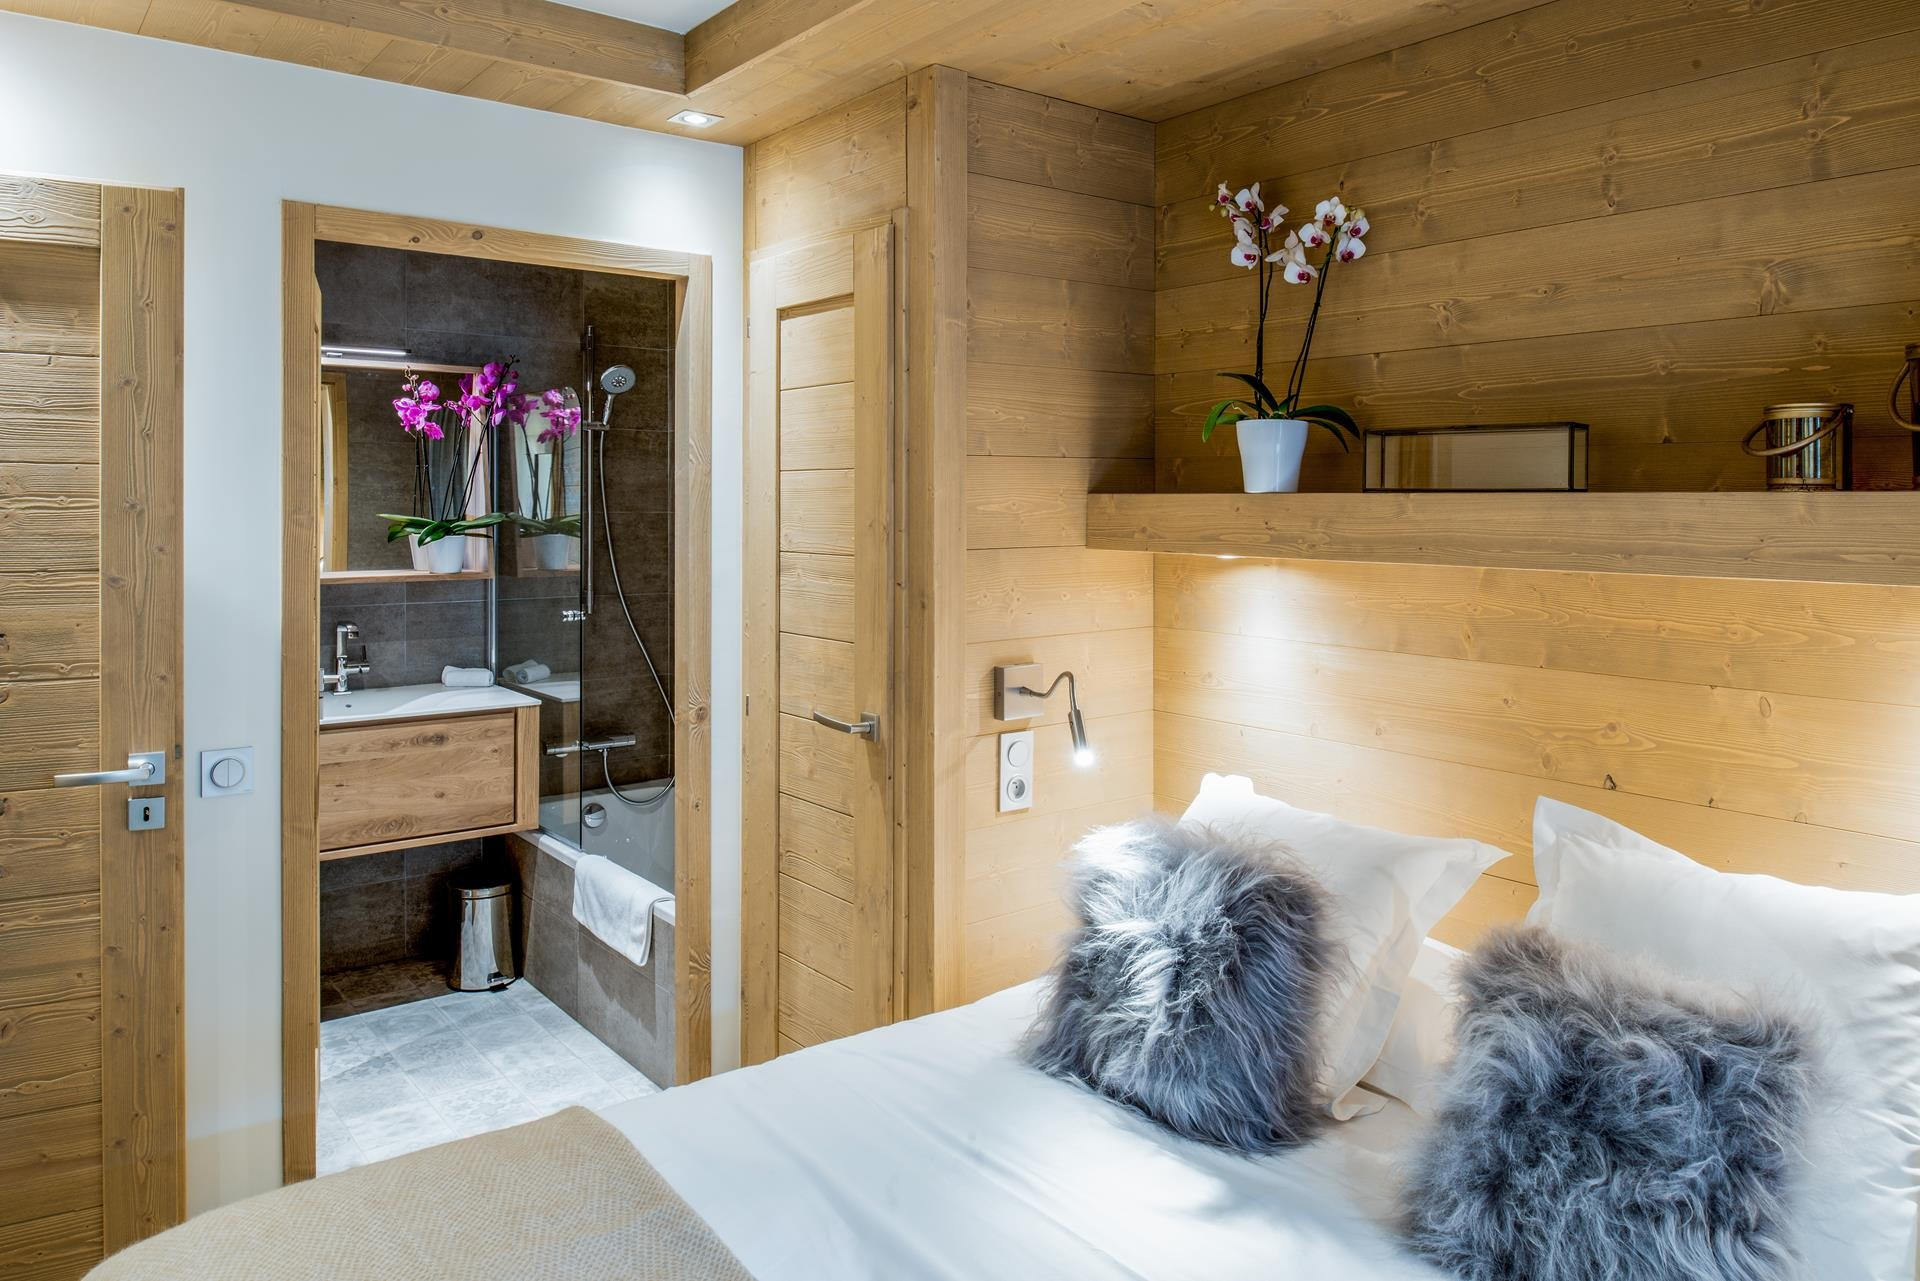 Courchevel 1650 Location Appartement Luxe Amarile Chambre 4